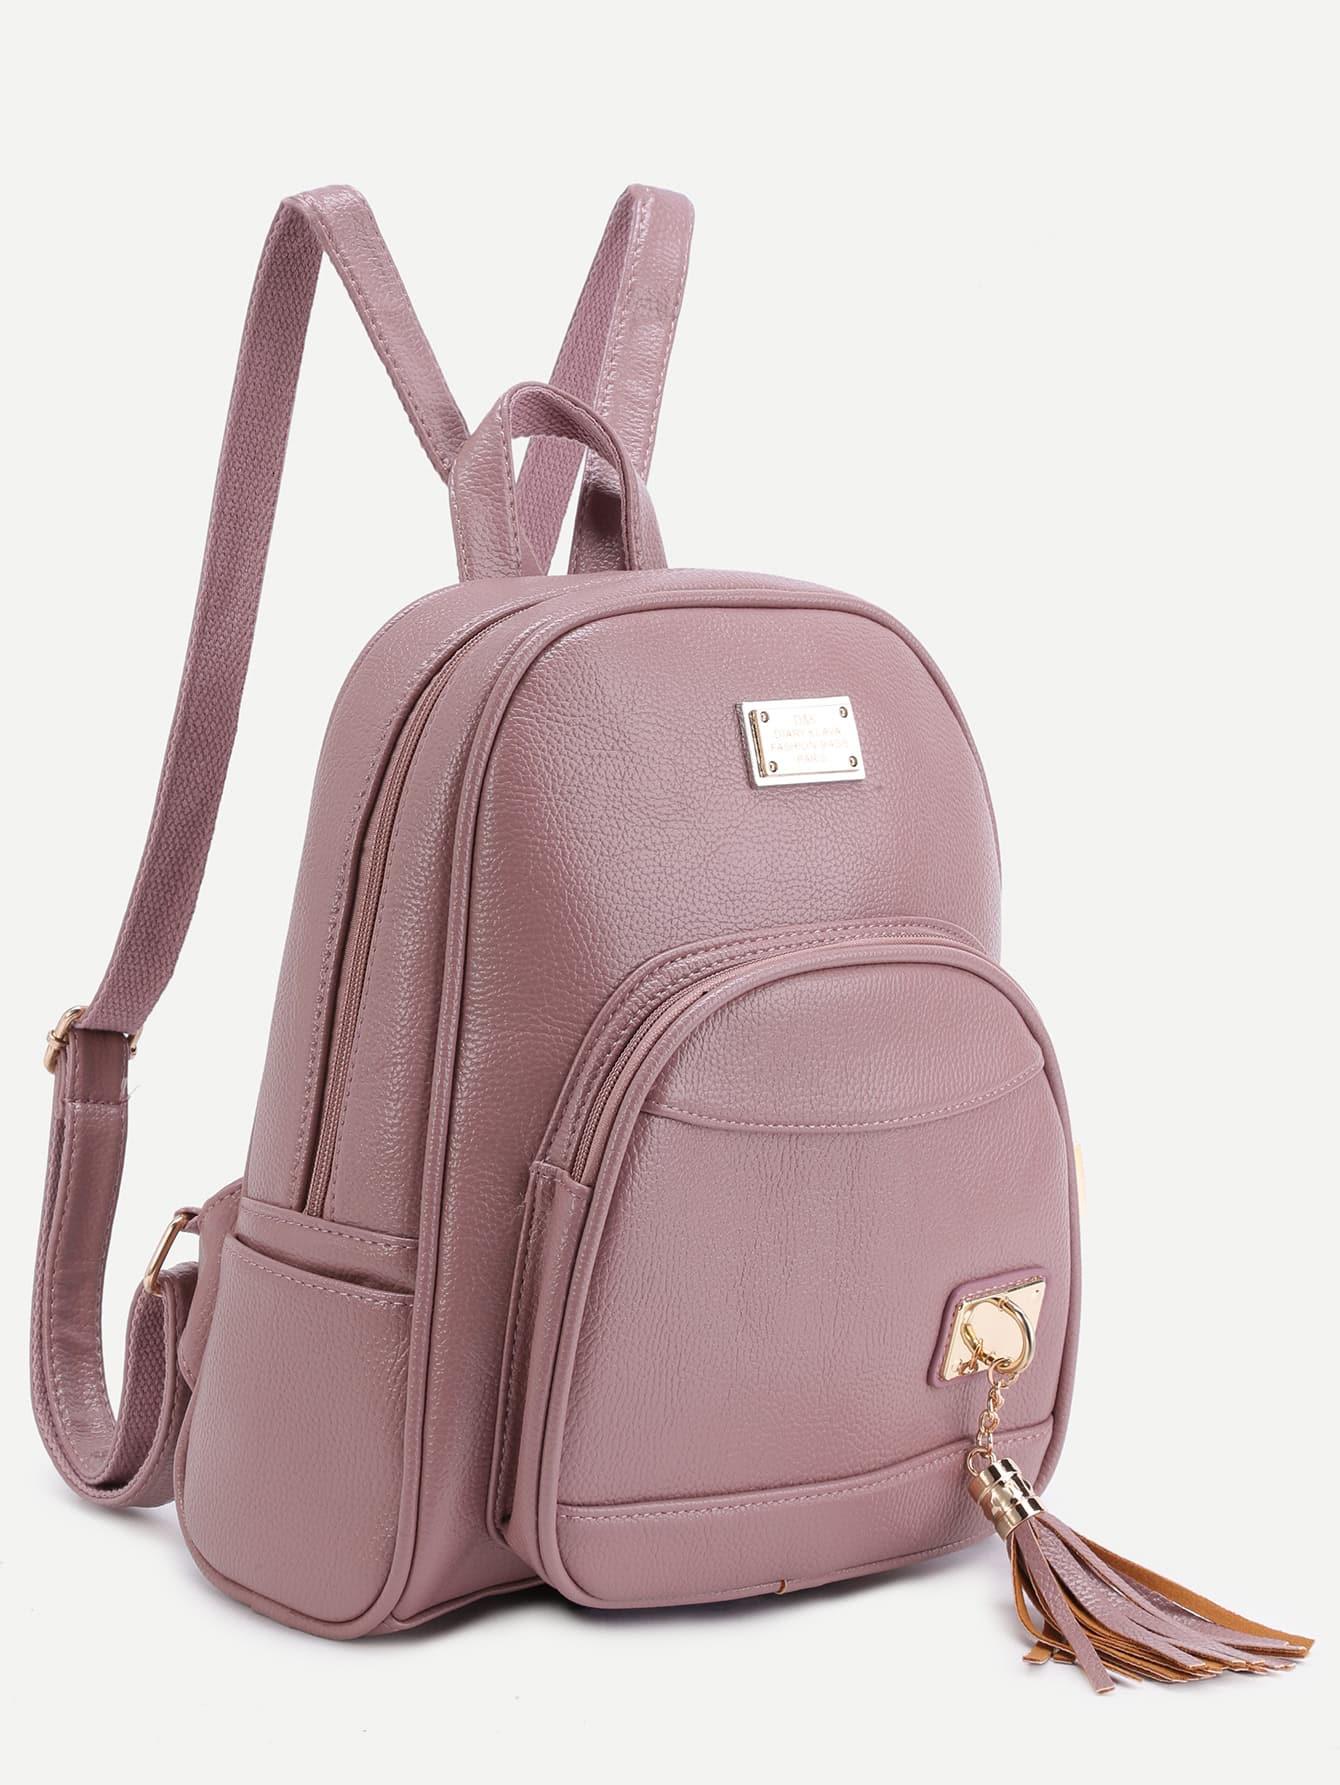 bag161005905_2